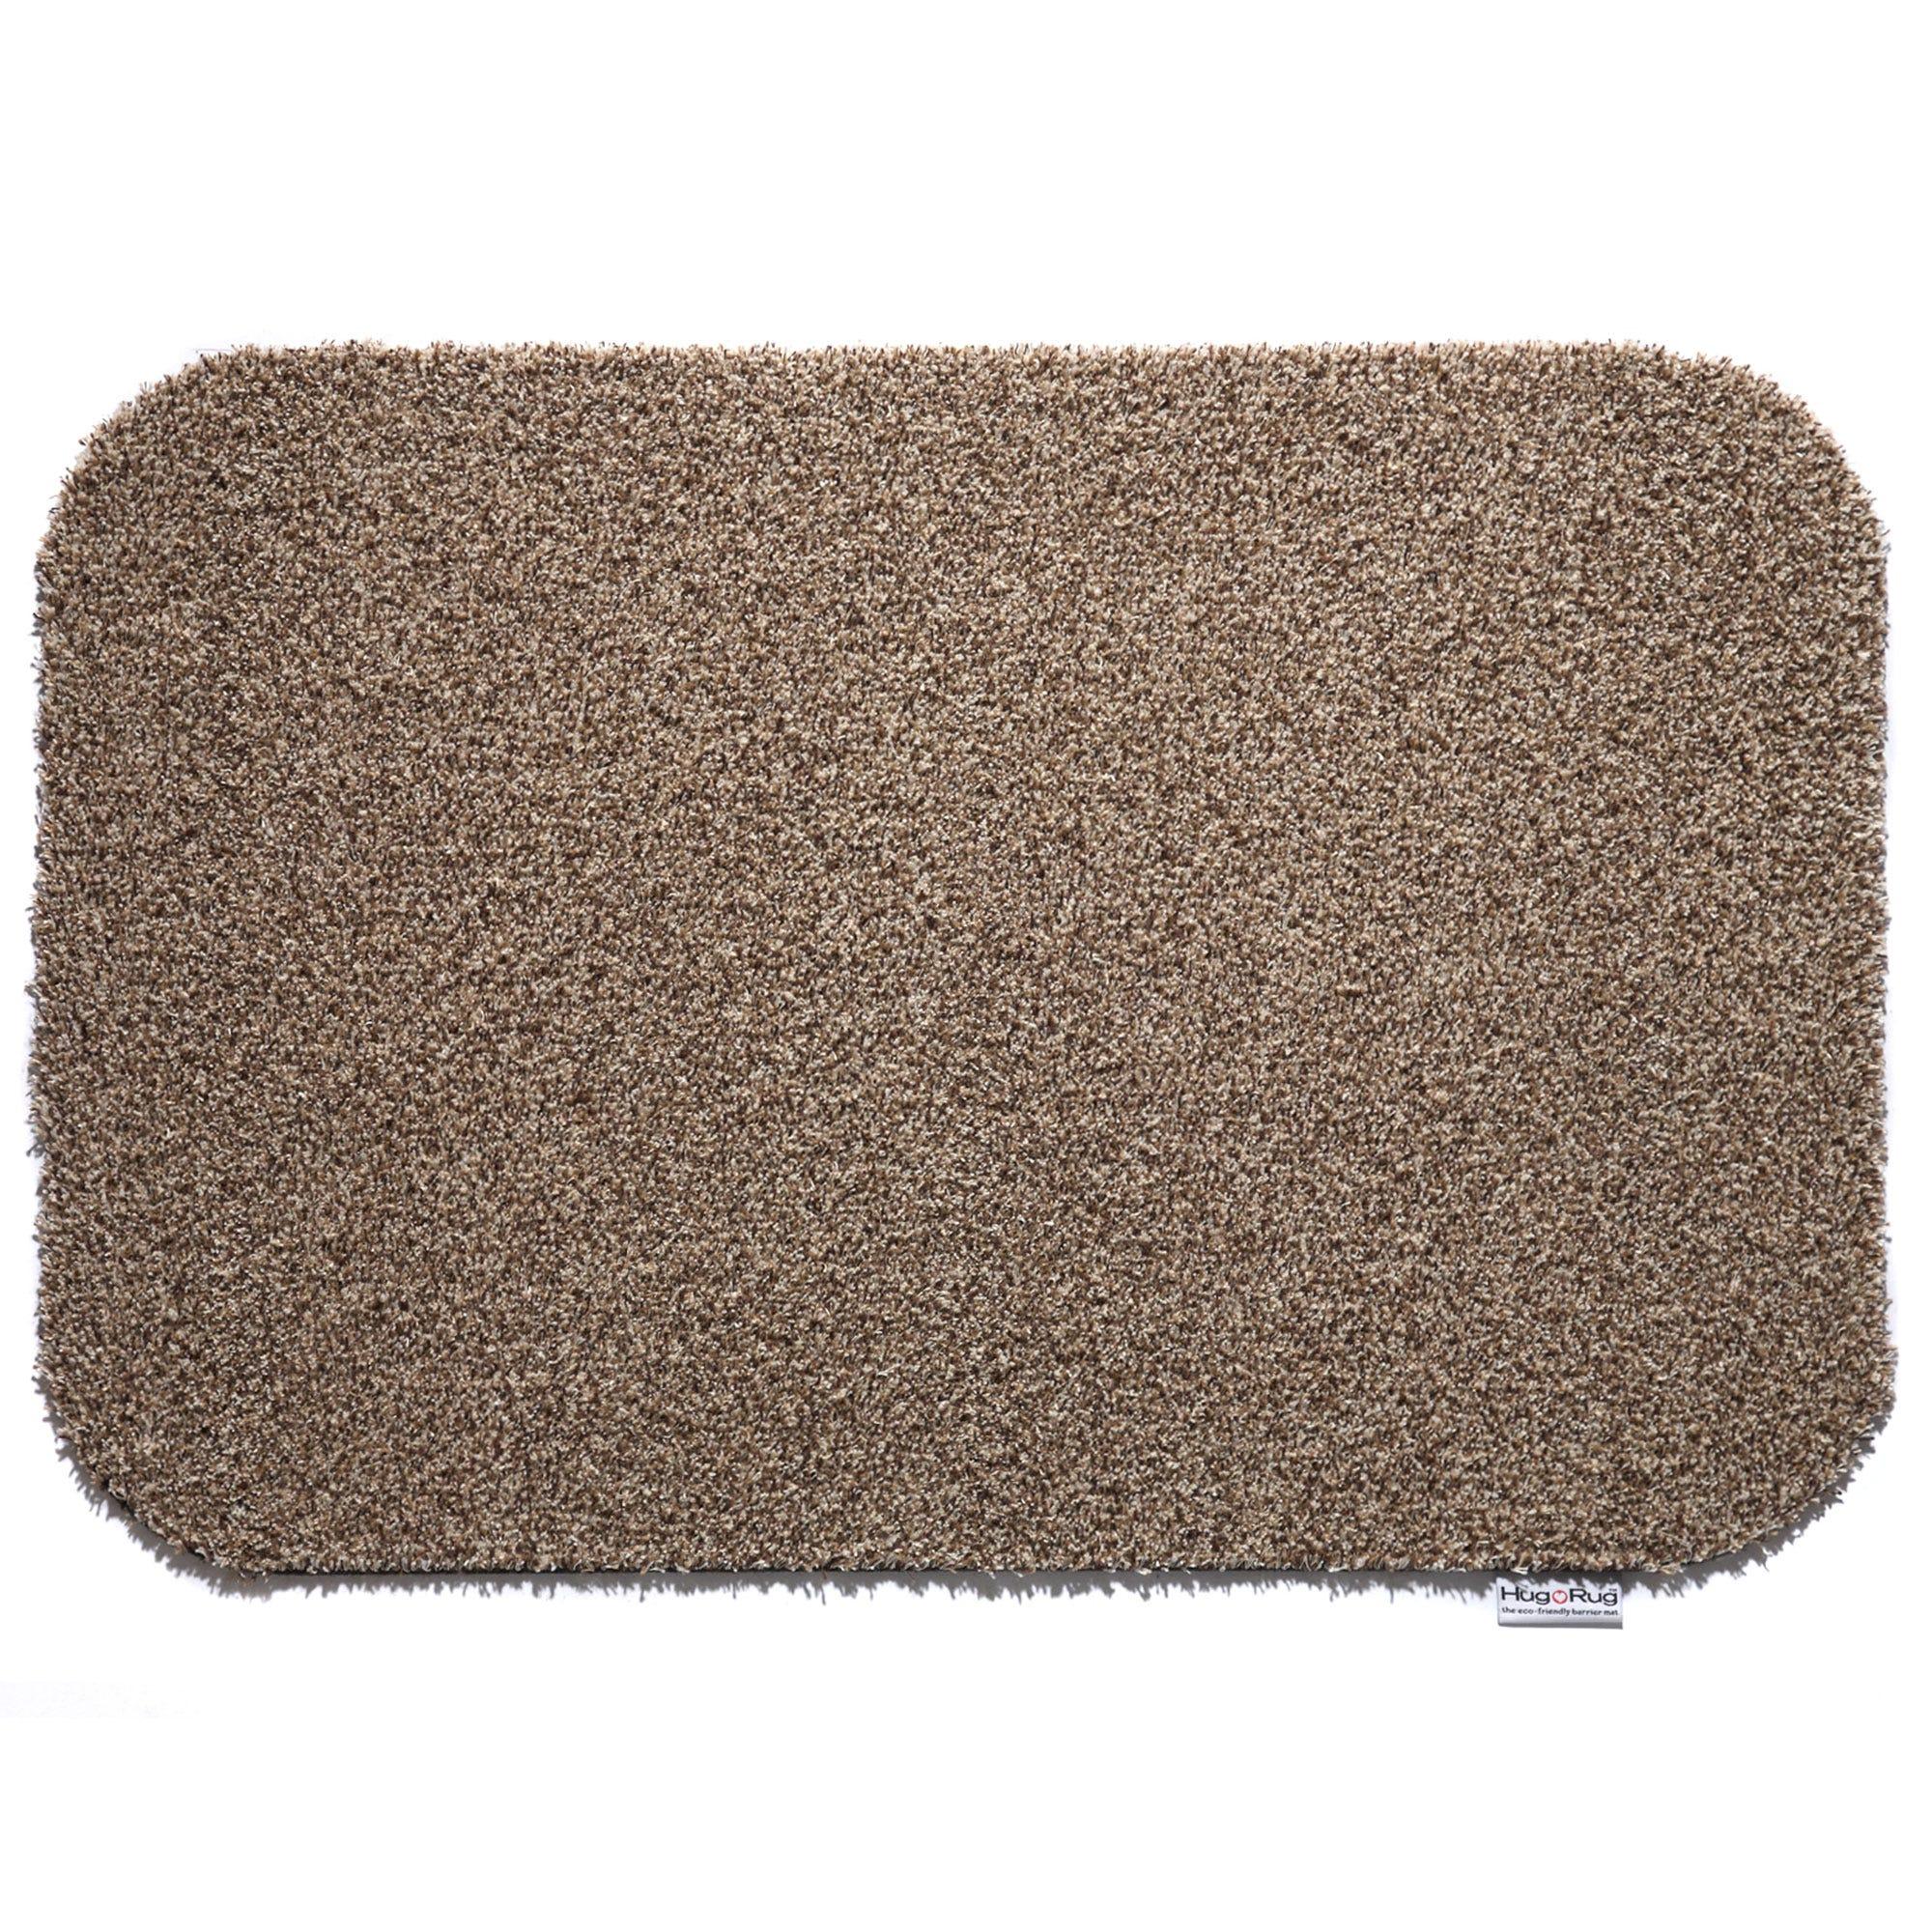 Compare prices for Hug Rug 50 x 75cm Doormat - Linen